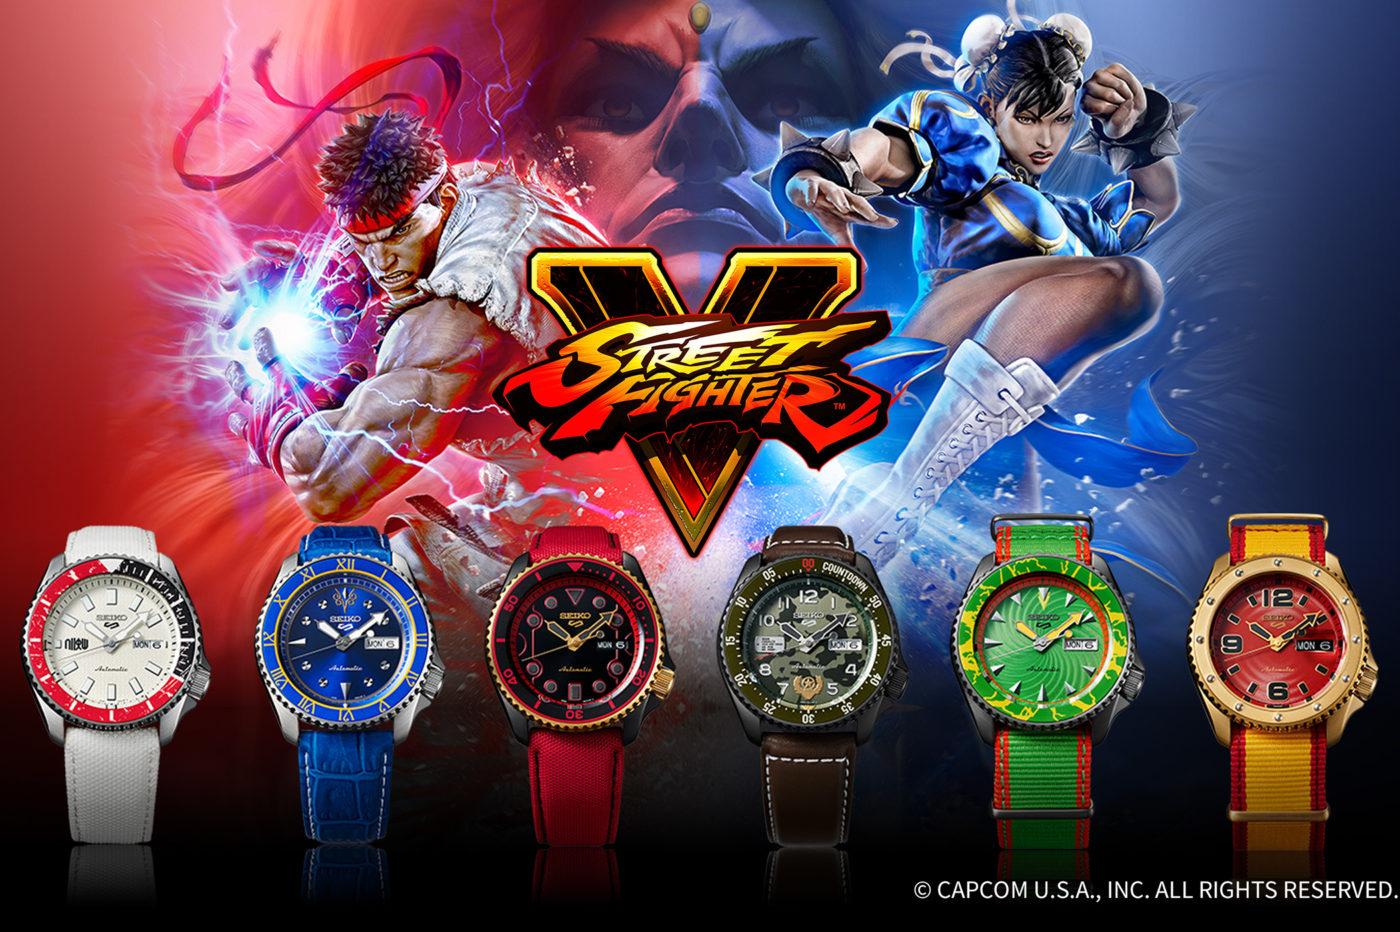 Seiko 5 Sports x Street Fighter V [dostępność, cena]